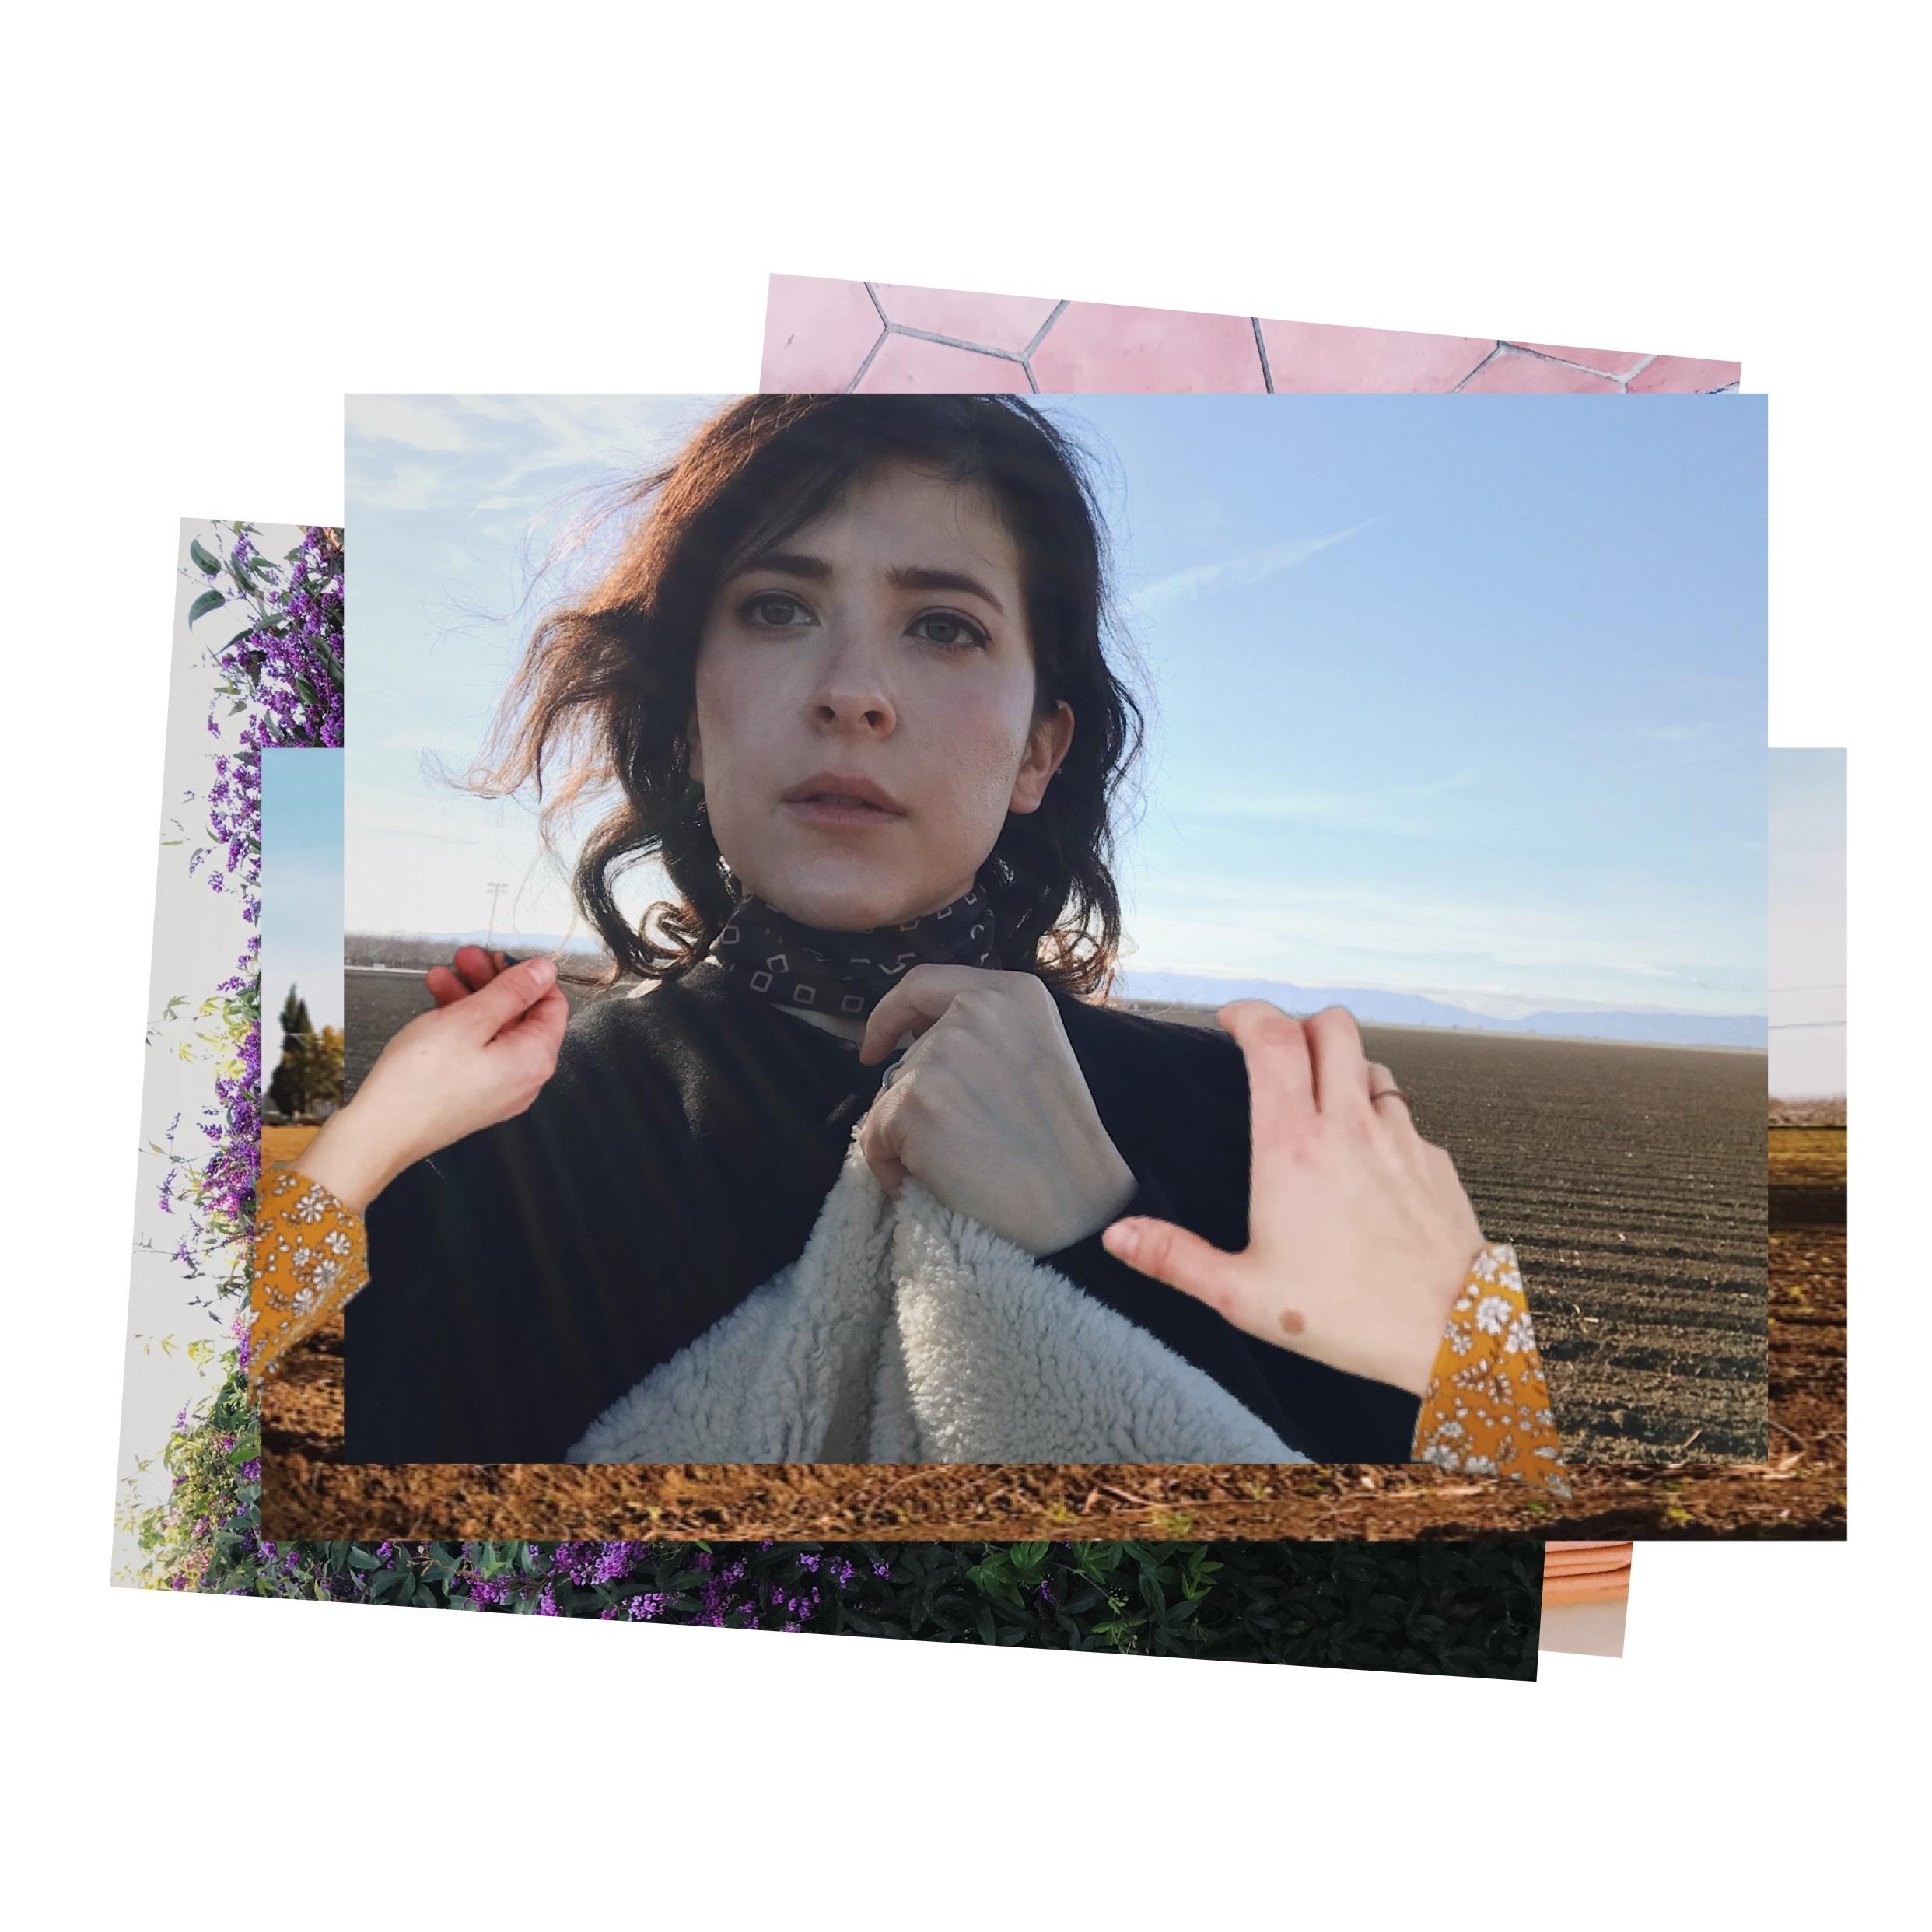 Olga Montserrat, twelveofour.com